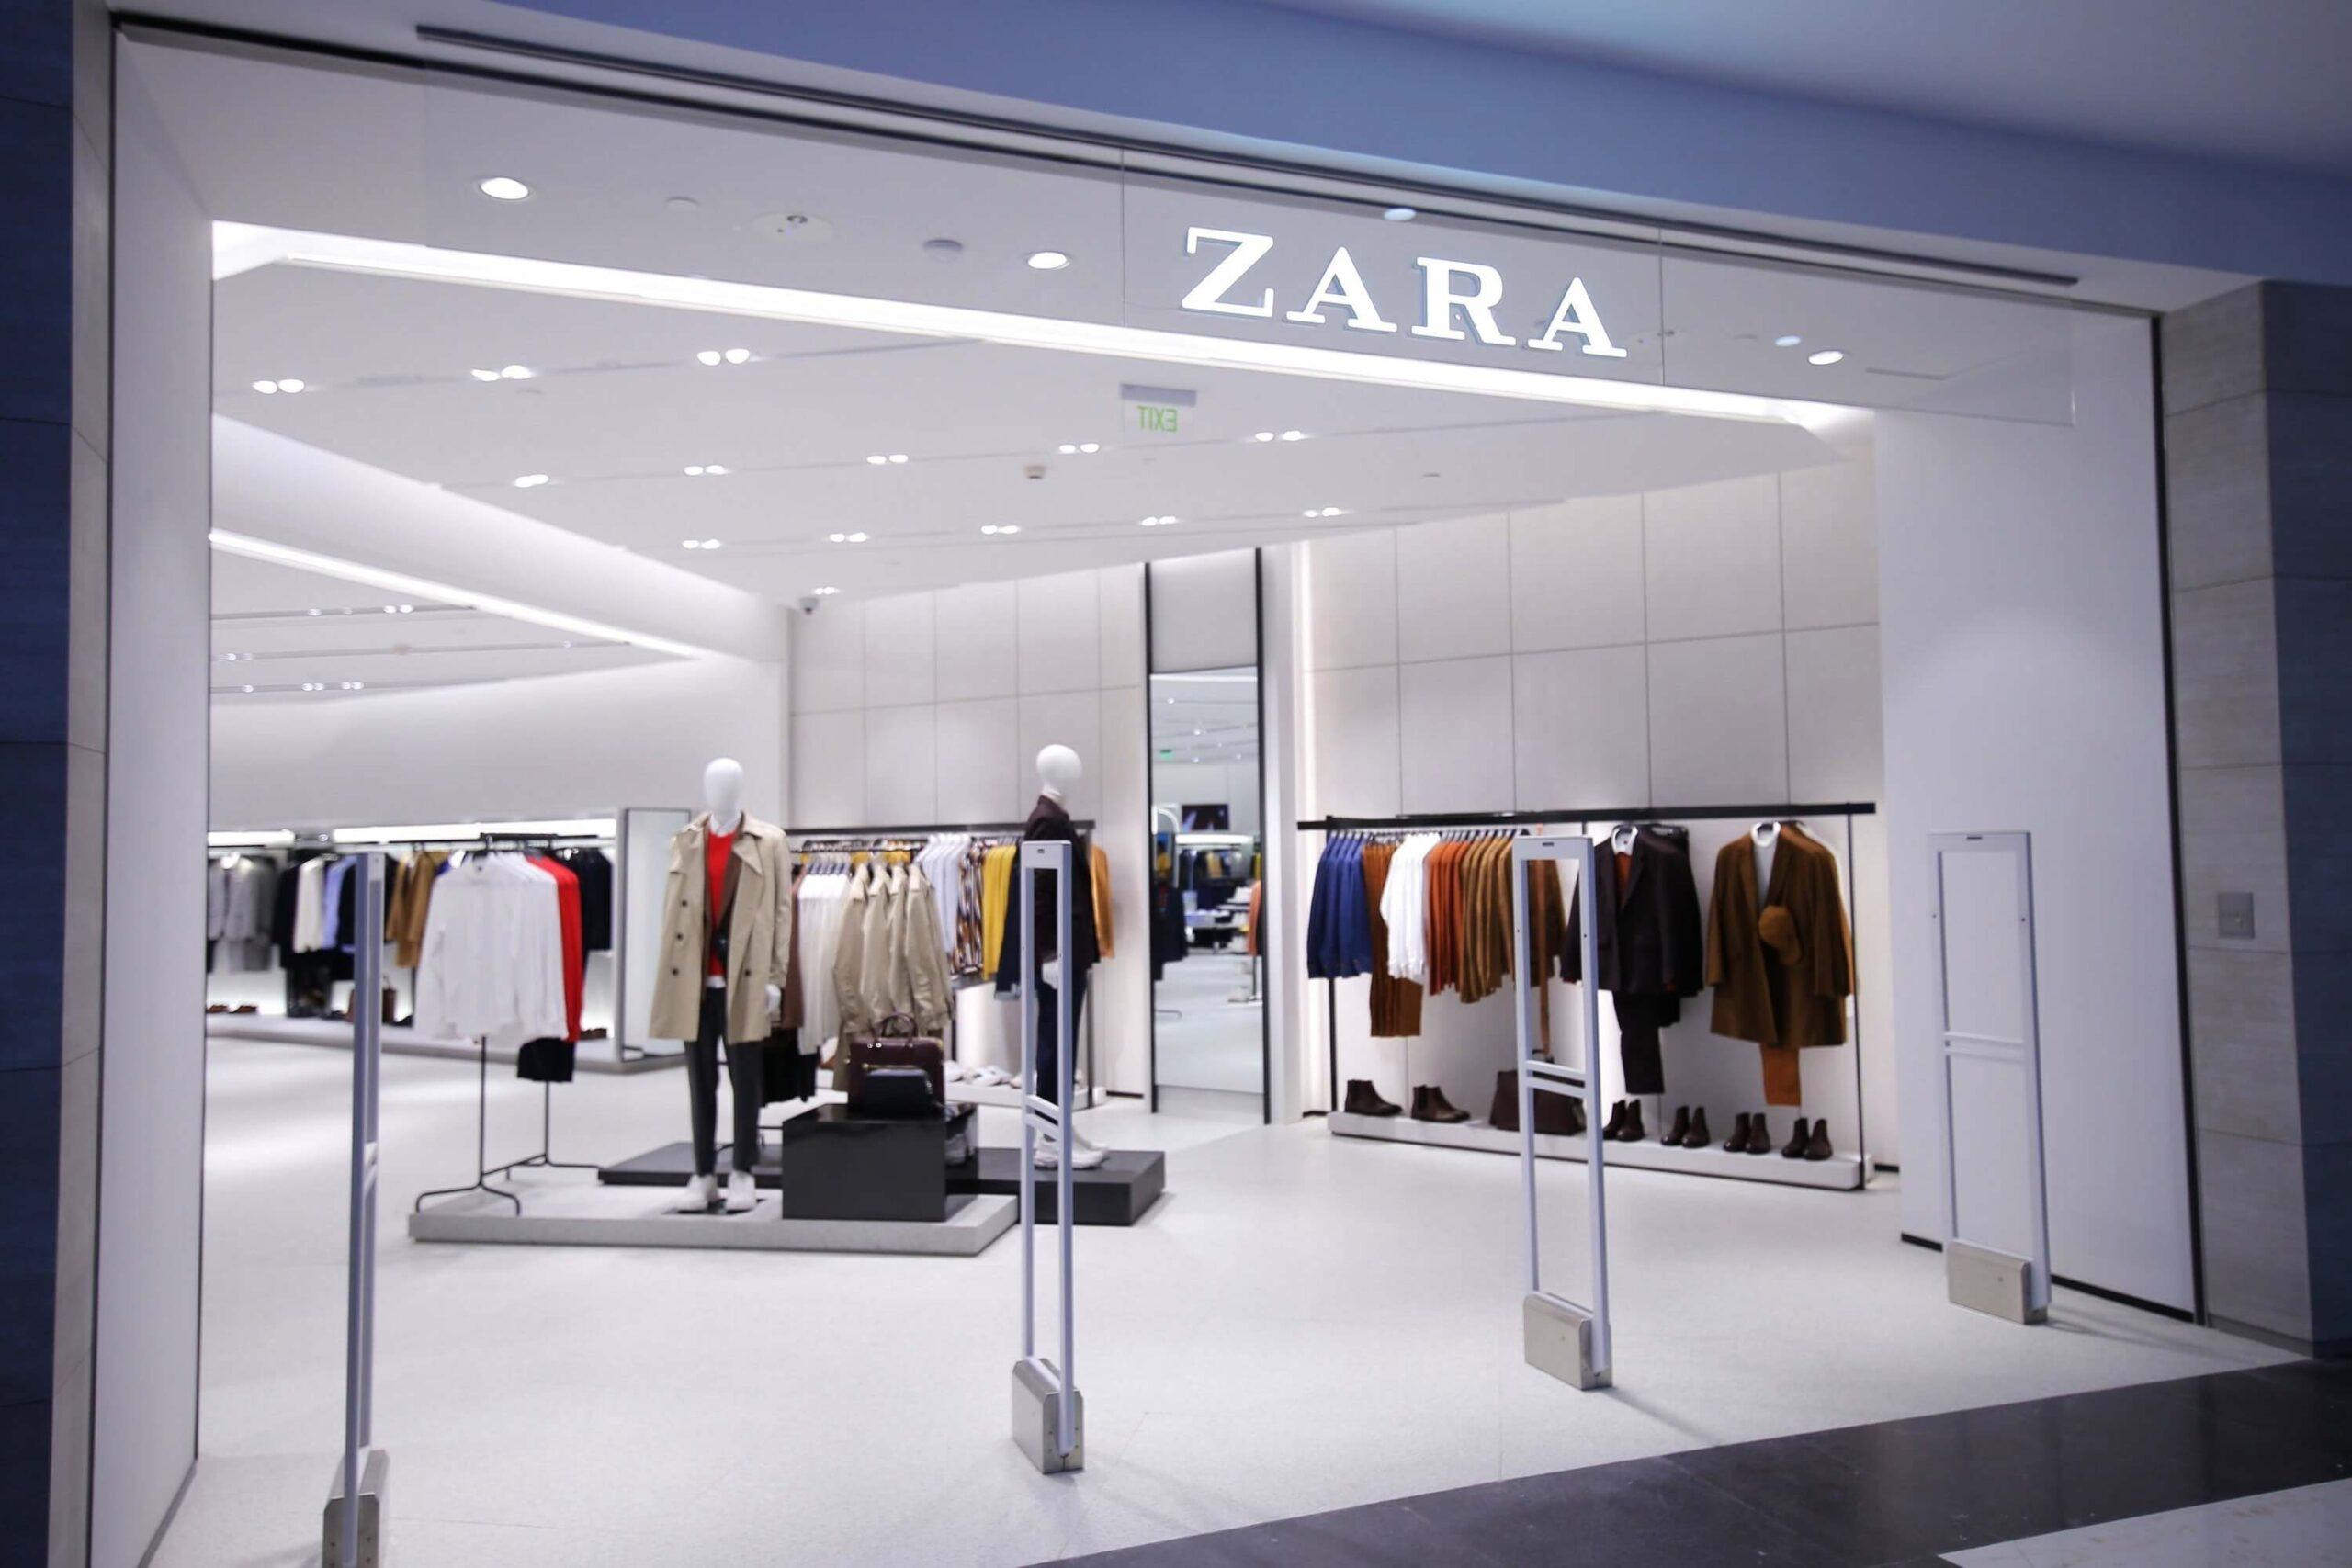 Zara designer head's anti-Muslim & anti-Palestinian remarks set off a firestorm